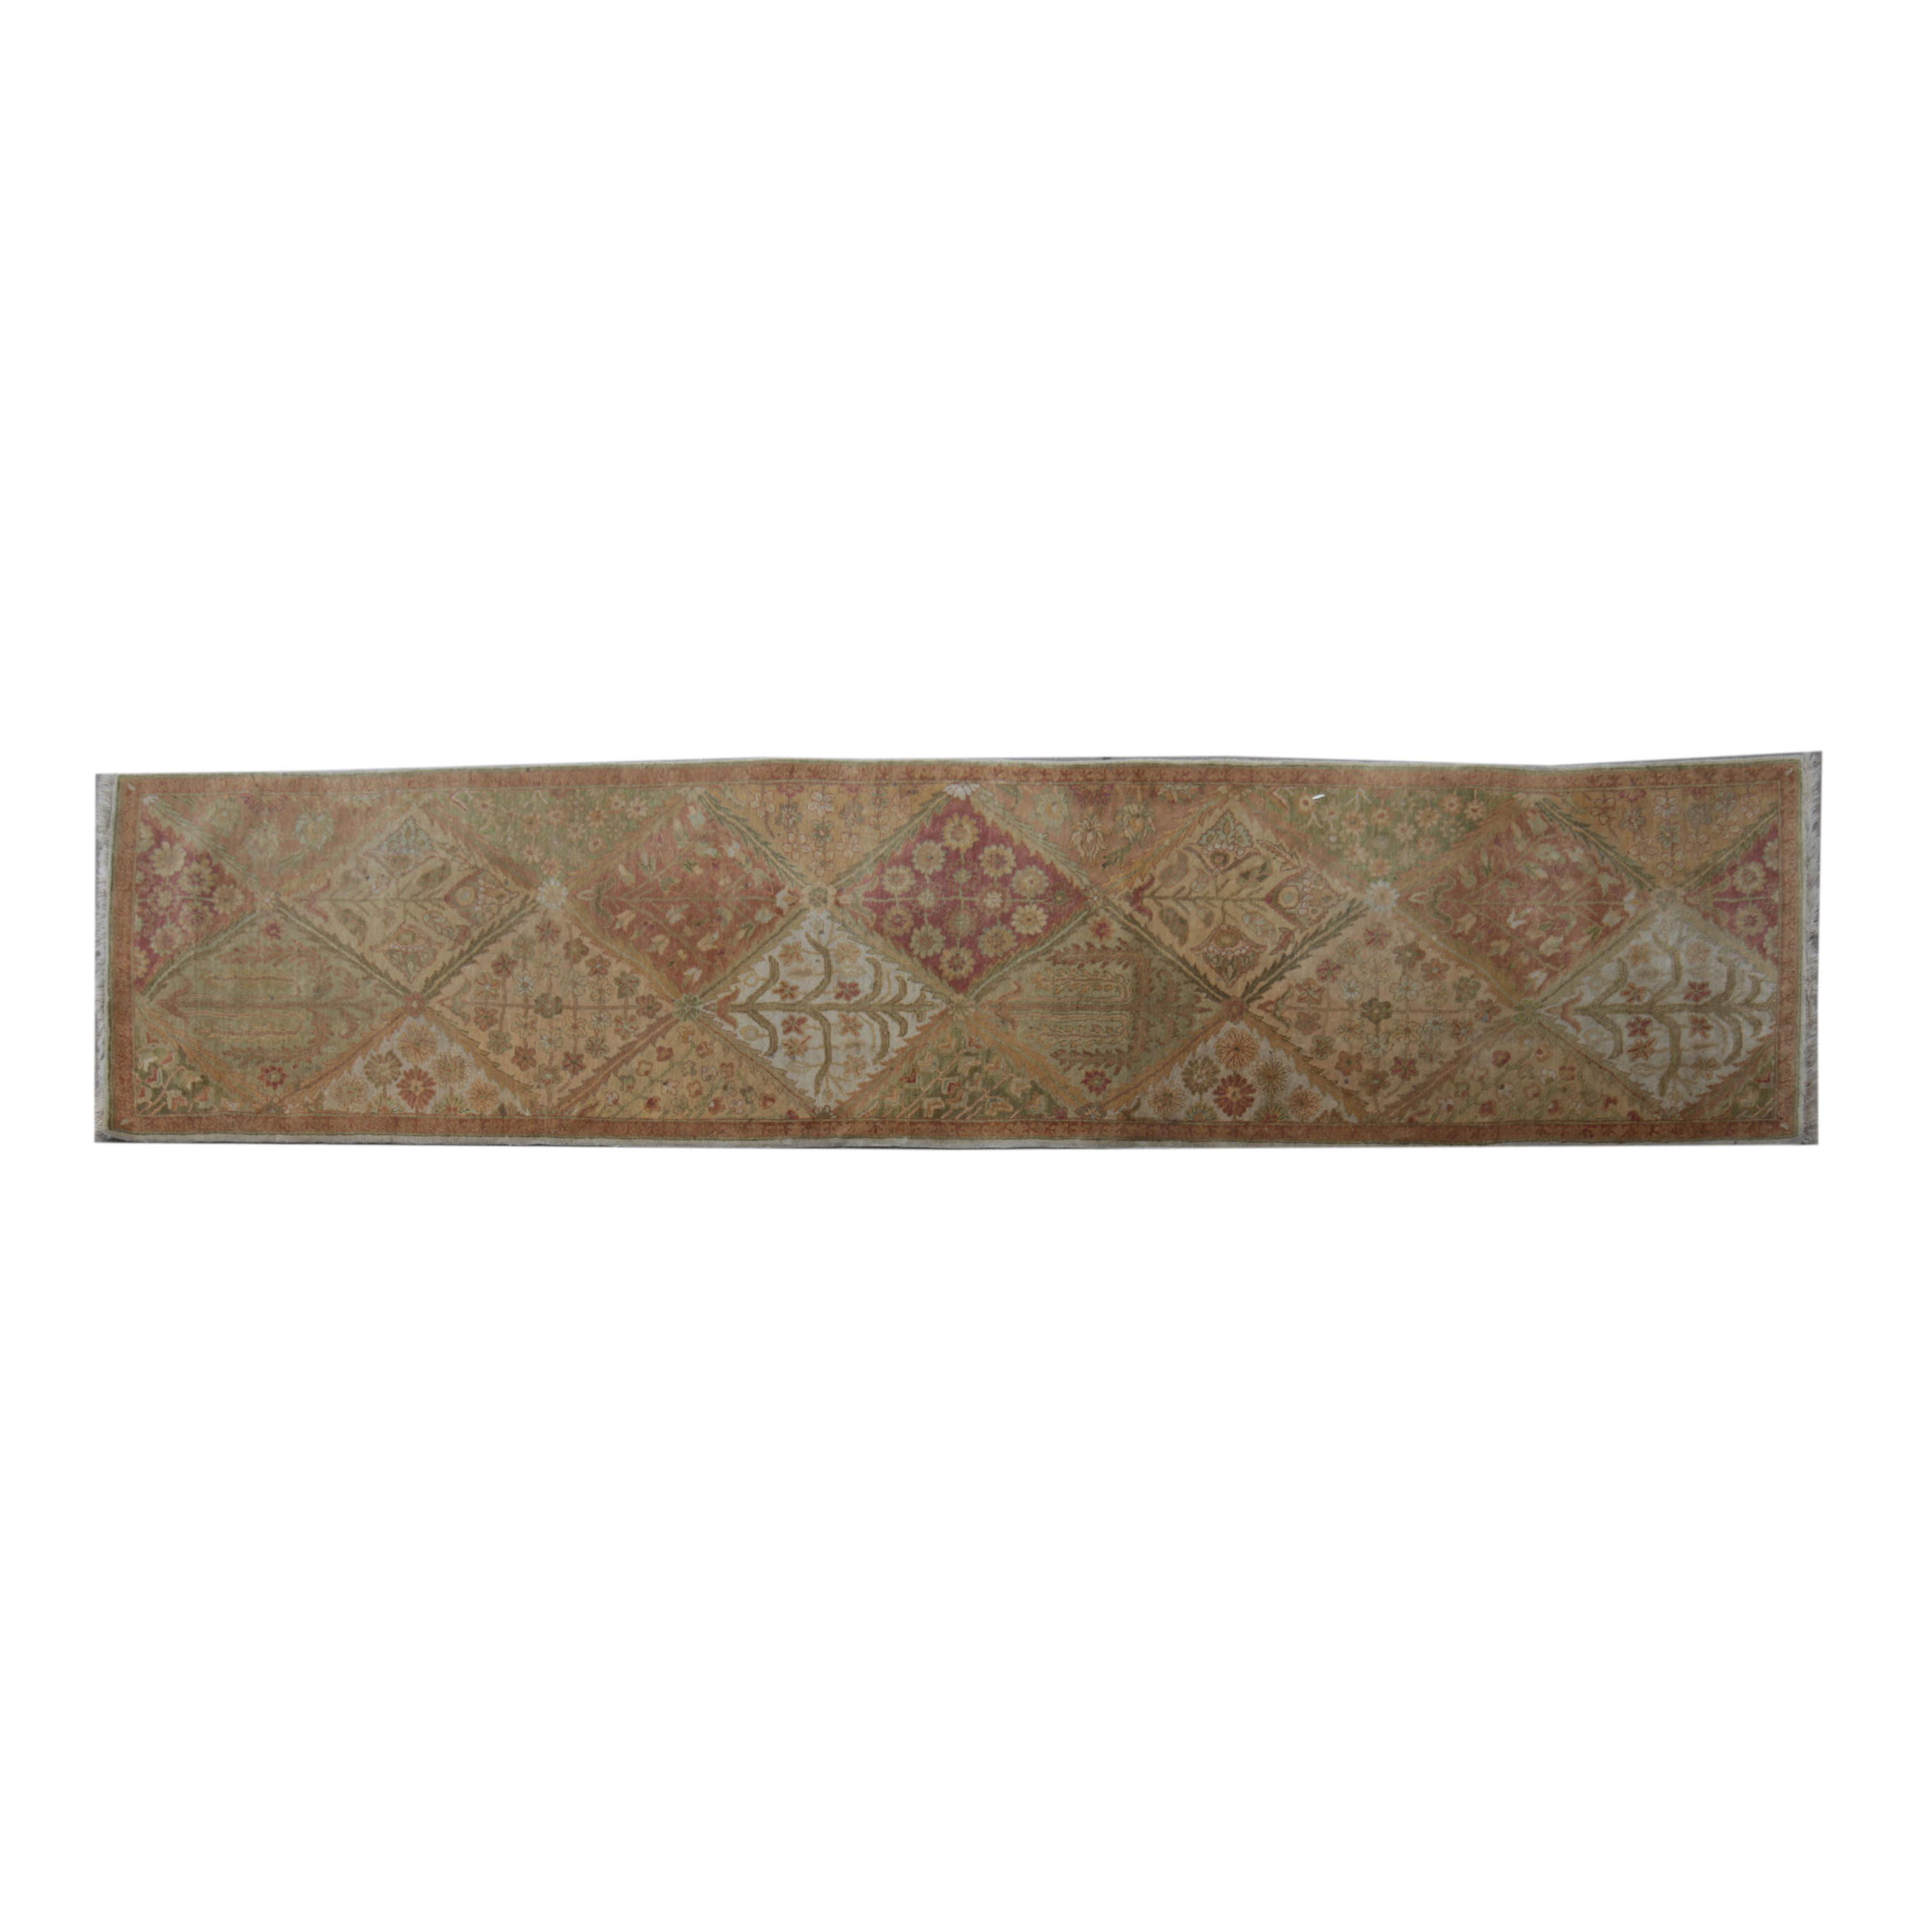 Hand-Knotted Bakhtiari Garden Panel Wool Carpet Runner